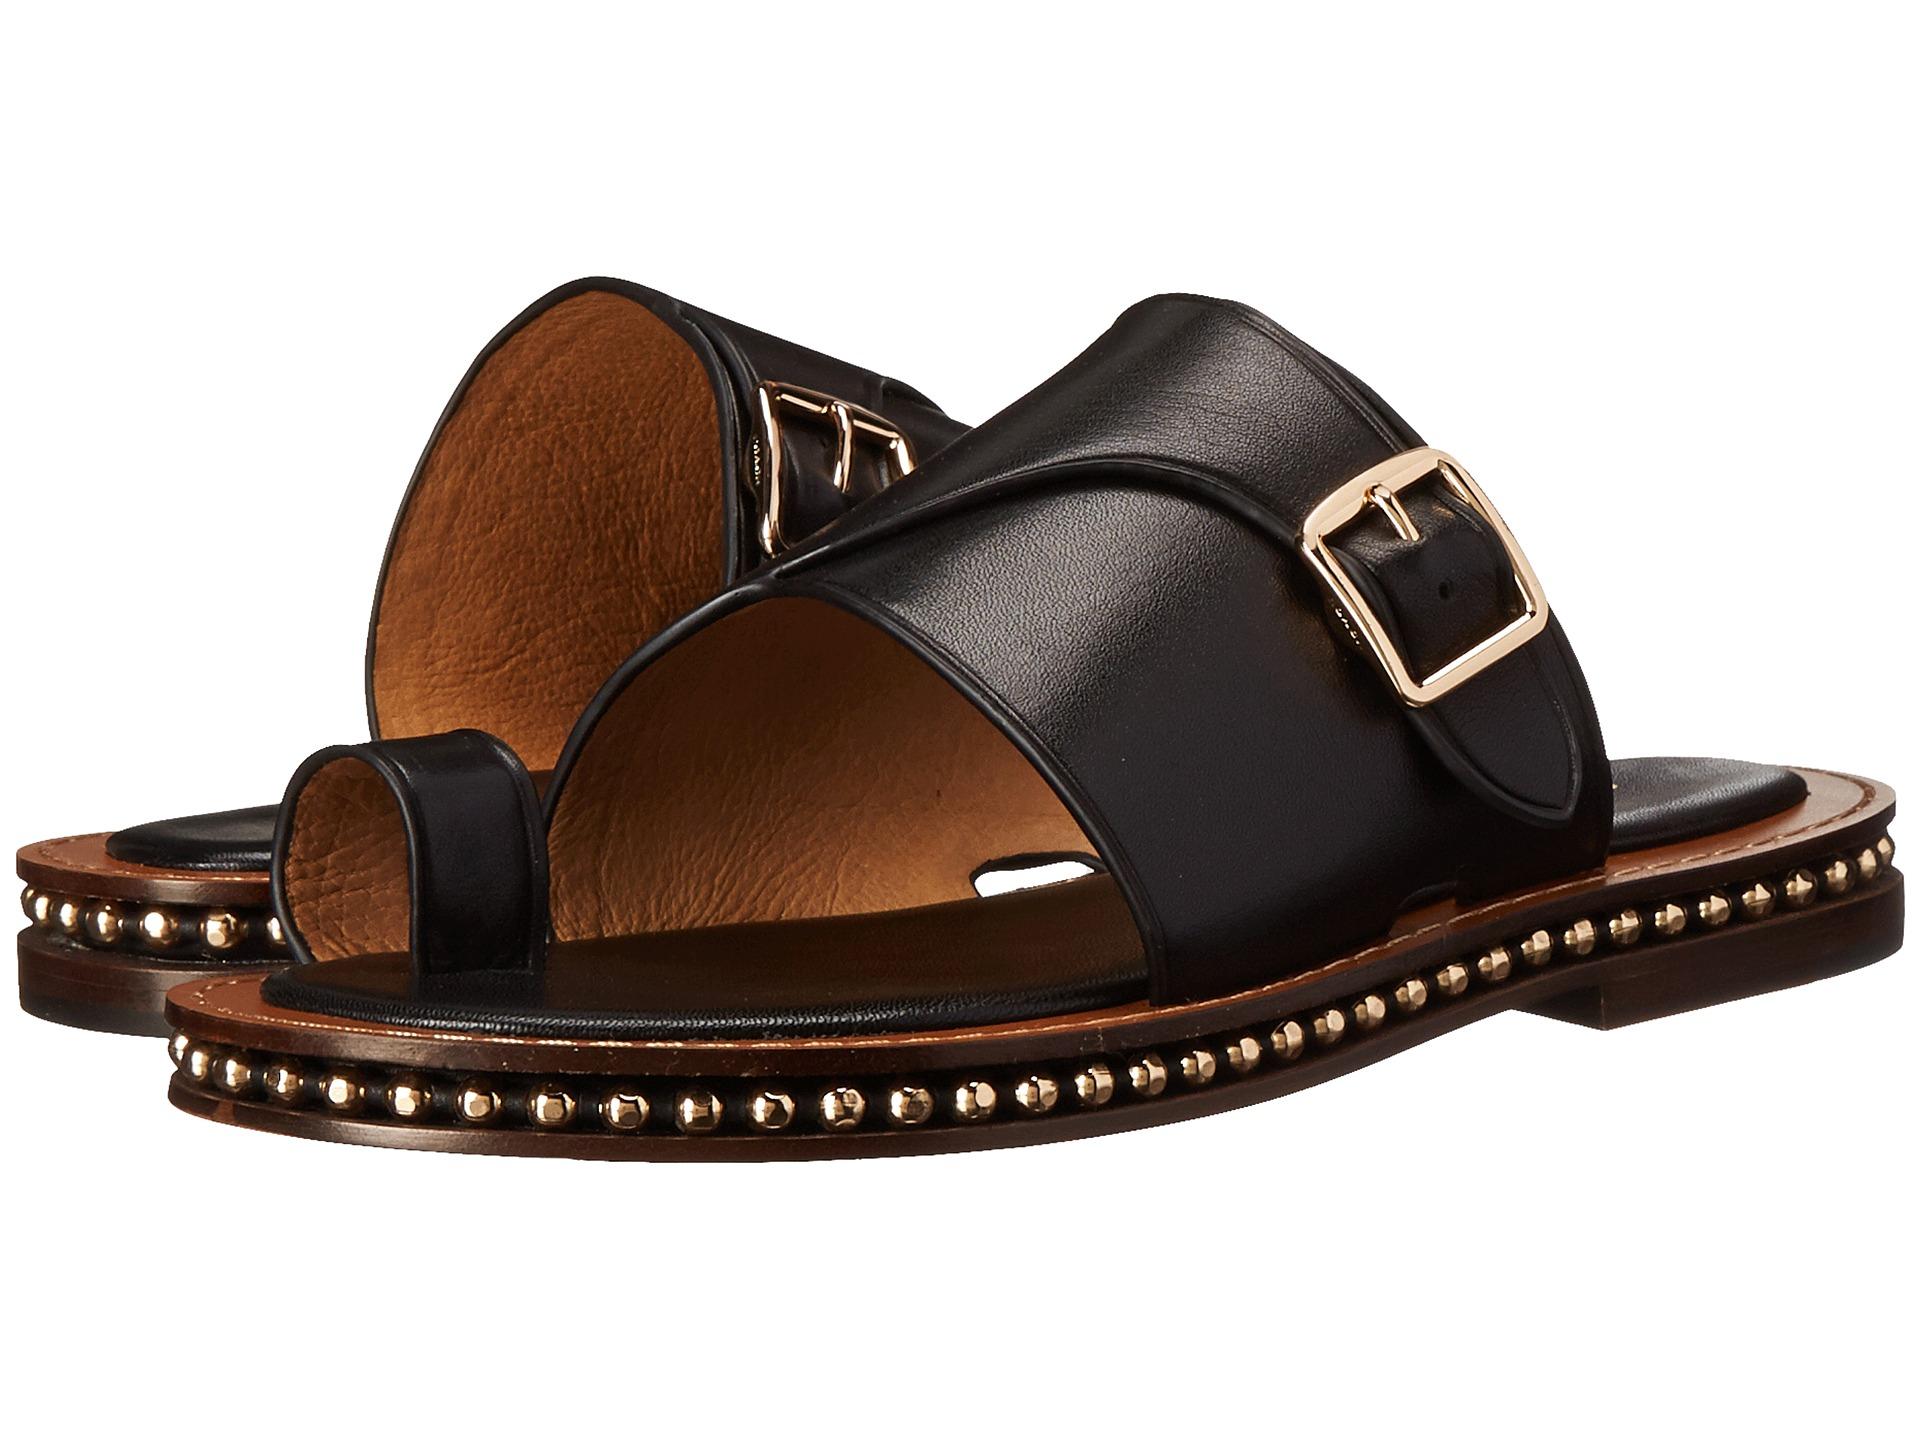 775d39fce7b6 Lyst coach alexa in black jpg 1920x1440 Coach slide sandals